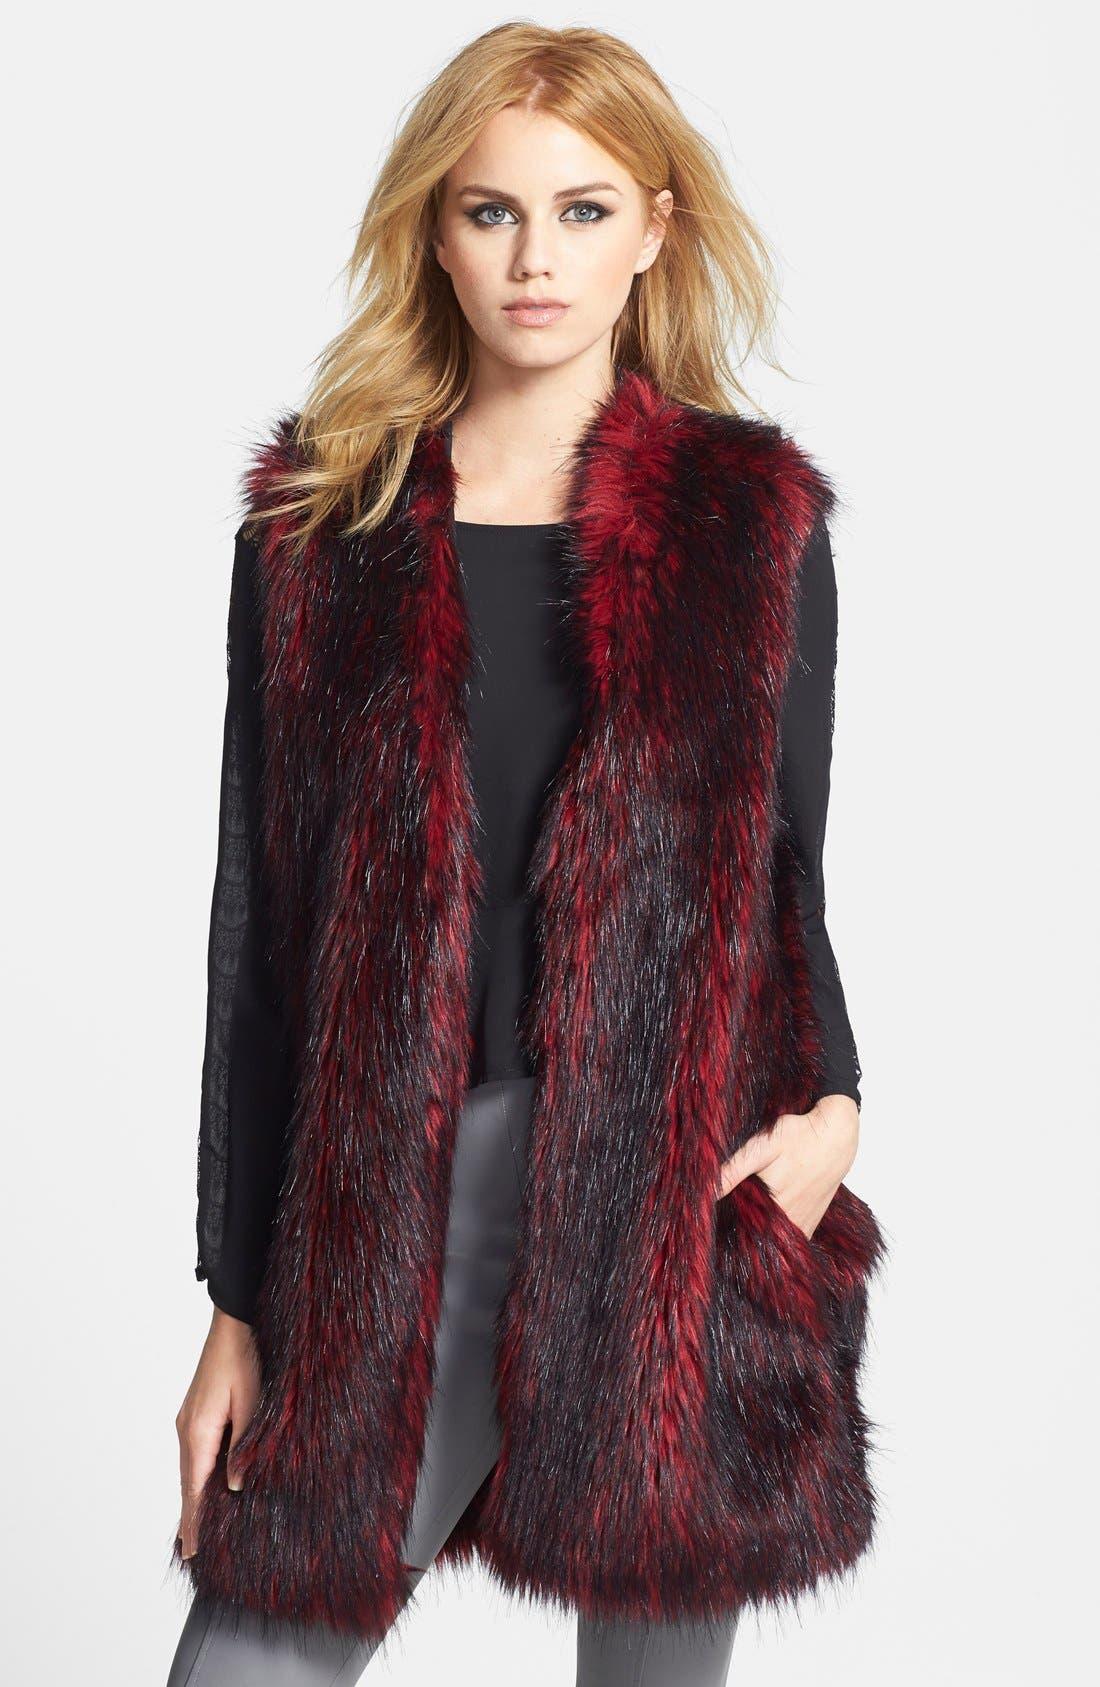 Alternate Image 1 Selected - WAYF Faux Fur Long Vest